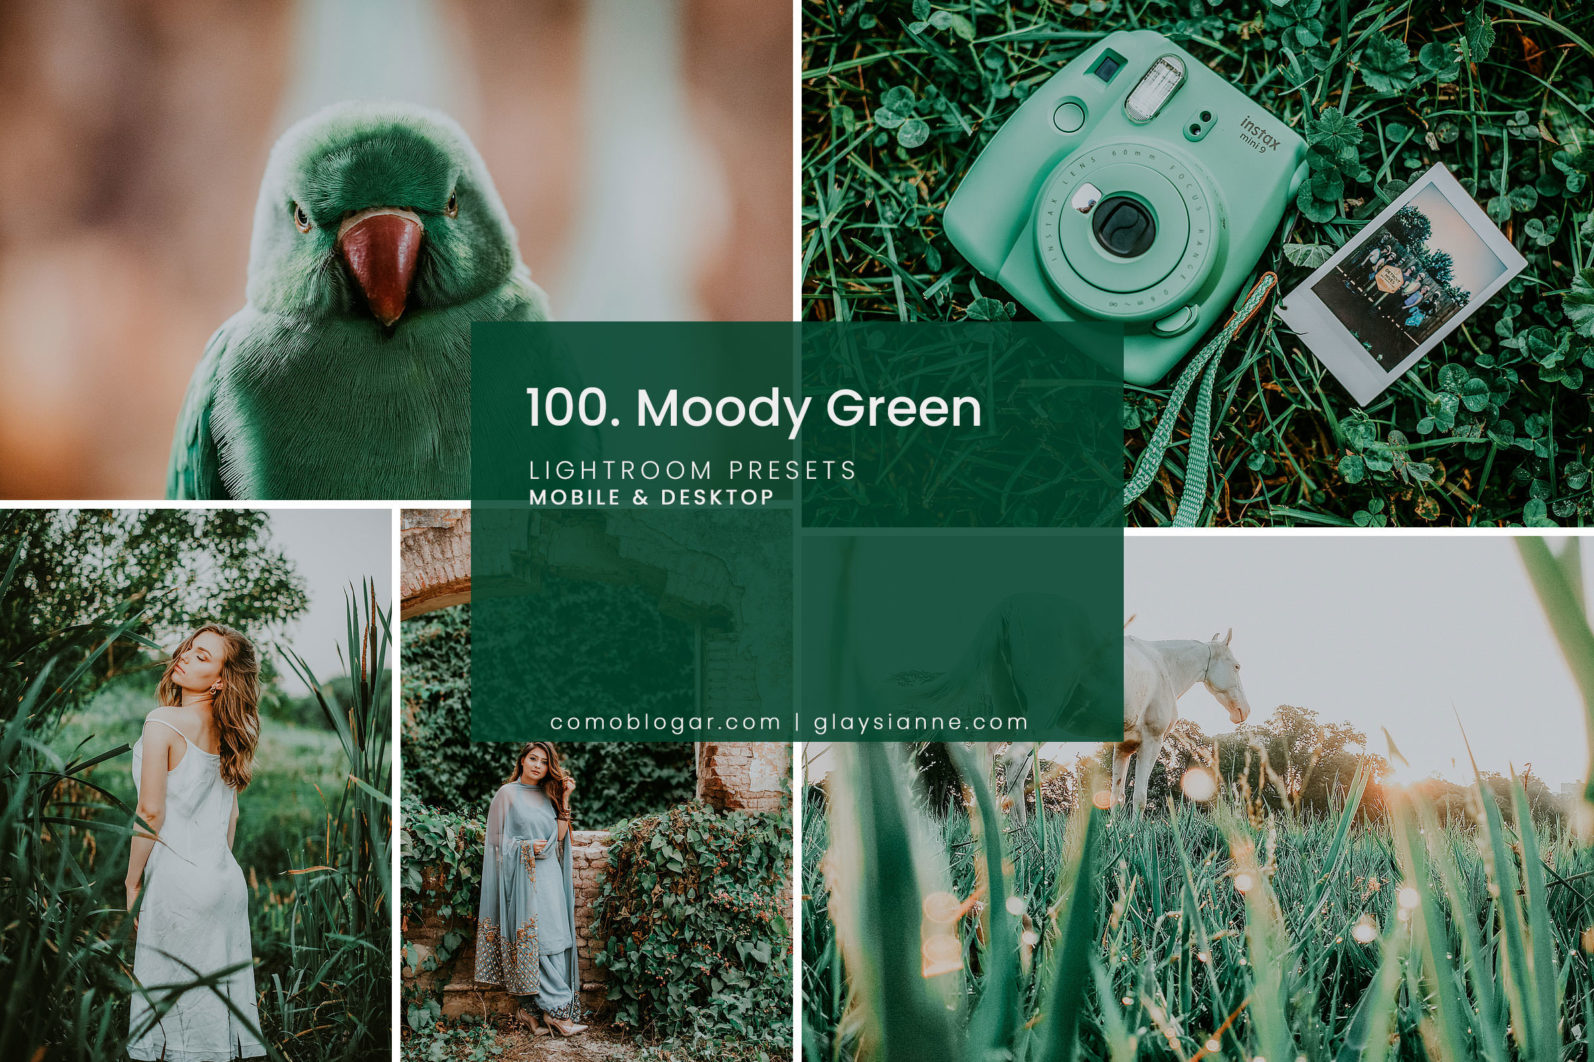 100. Moody Green - 100.Moody Green 01 -